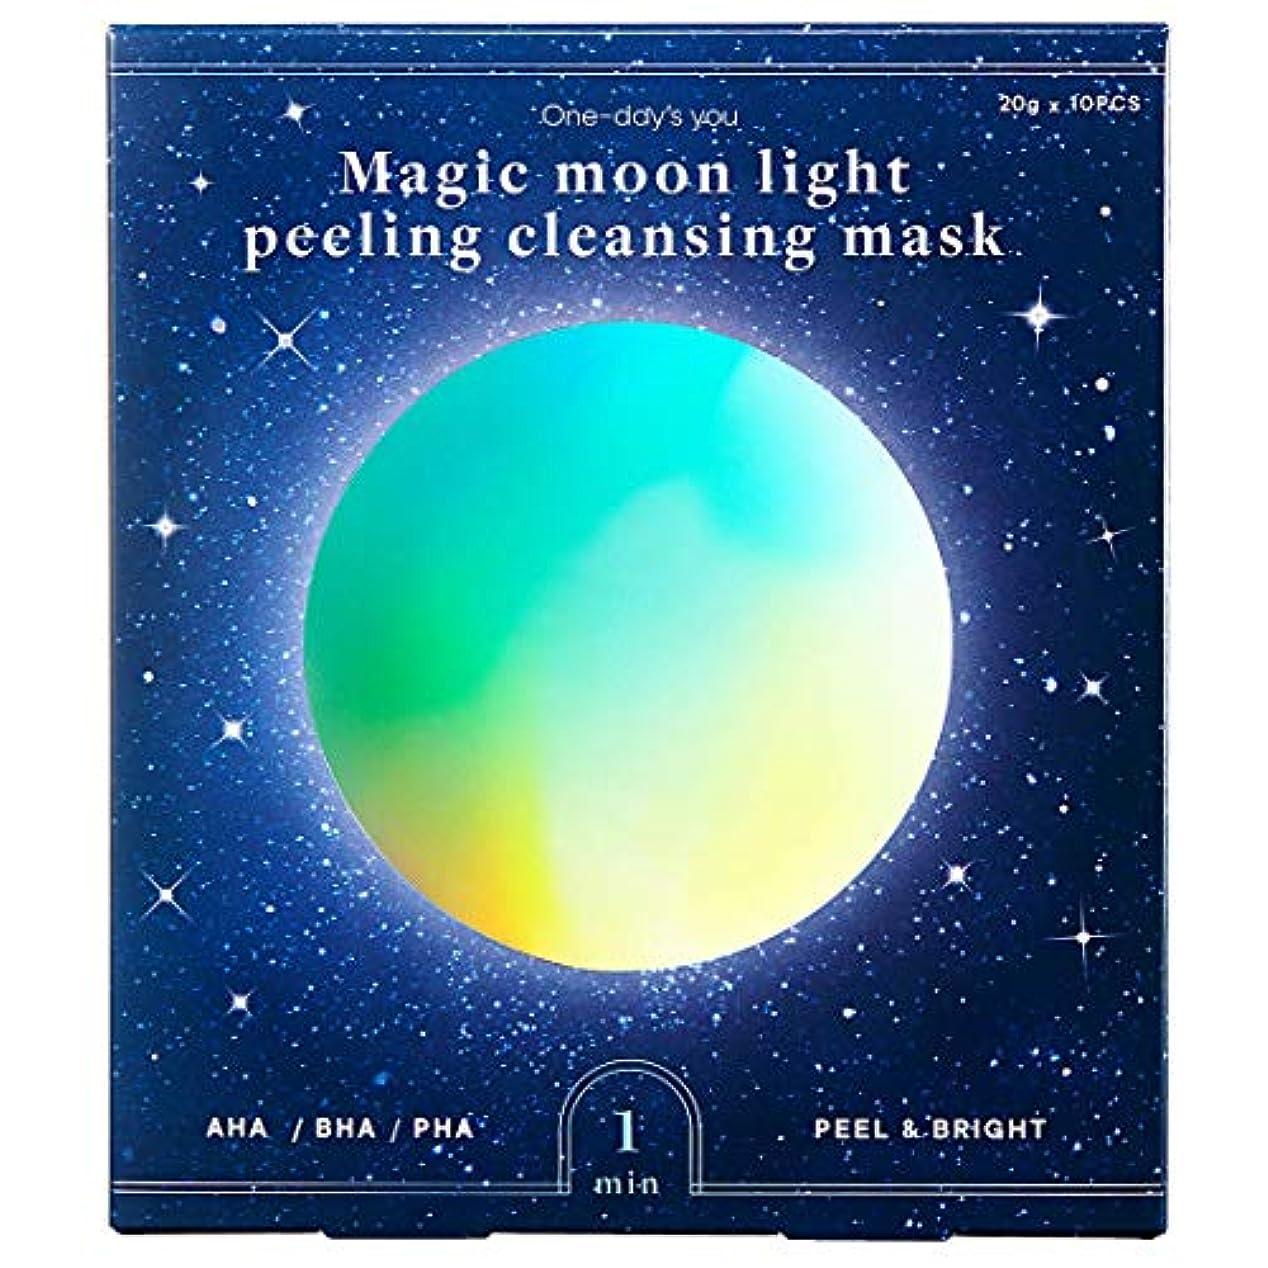 One day's you [ワンデイズユー ] マジック ムーンライト ピーリング クレンジング マスク/Magic Moonlight Peeling Cleansing Mask (20g*10ea) [並行輸入品]